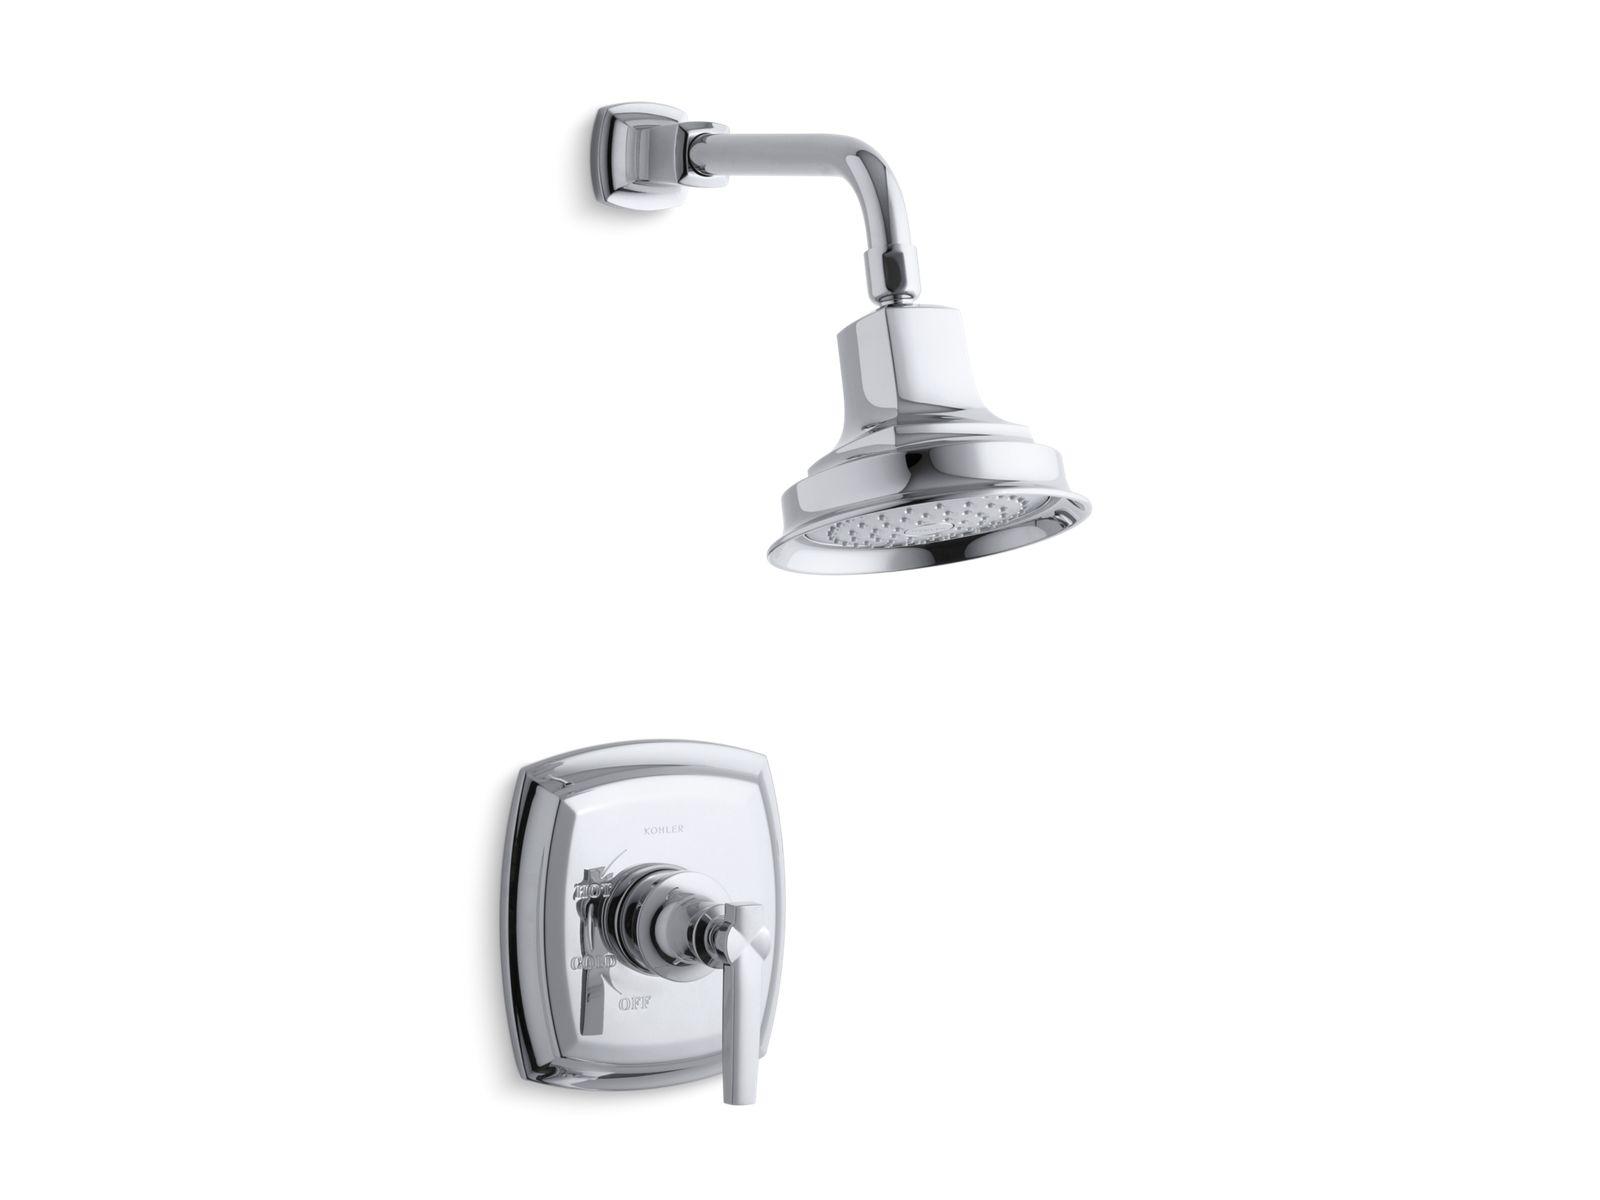 kts162344 margaux ritetemp shower valve trim with lever handle and 25 gpm showerhead kohler